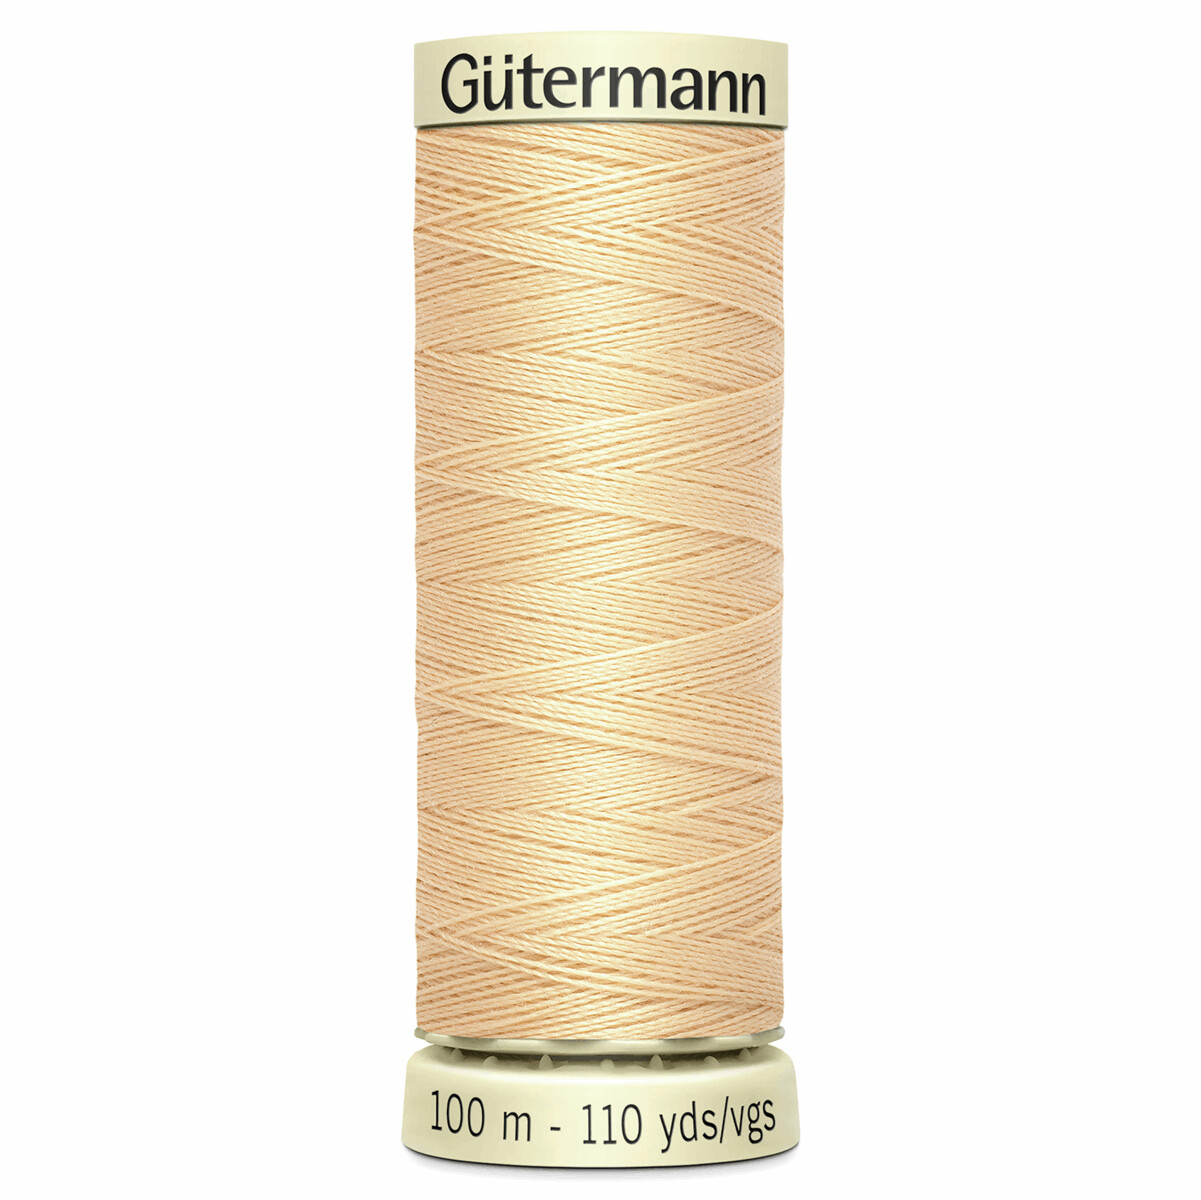 Gutermann Sew-All thread 06